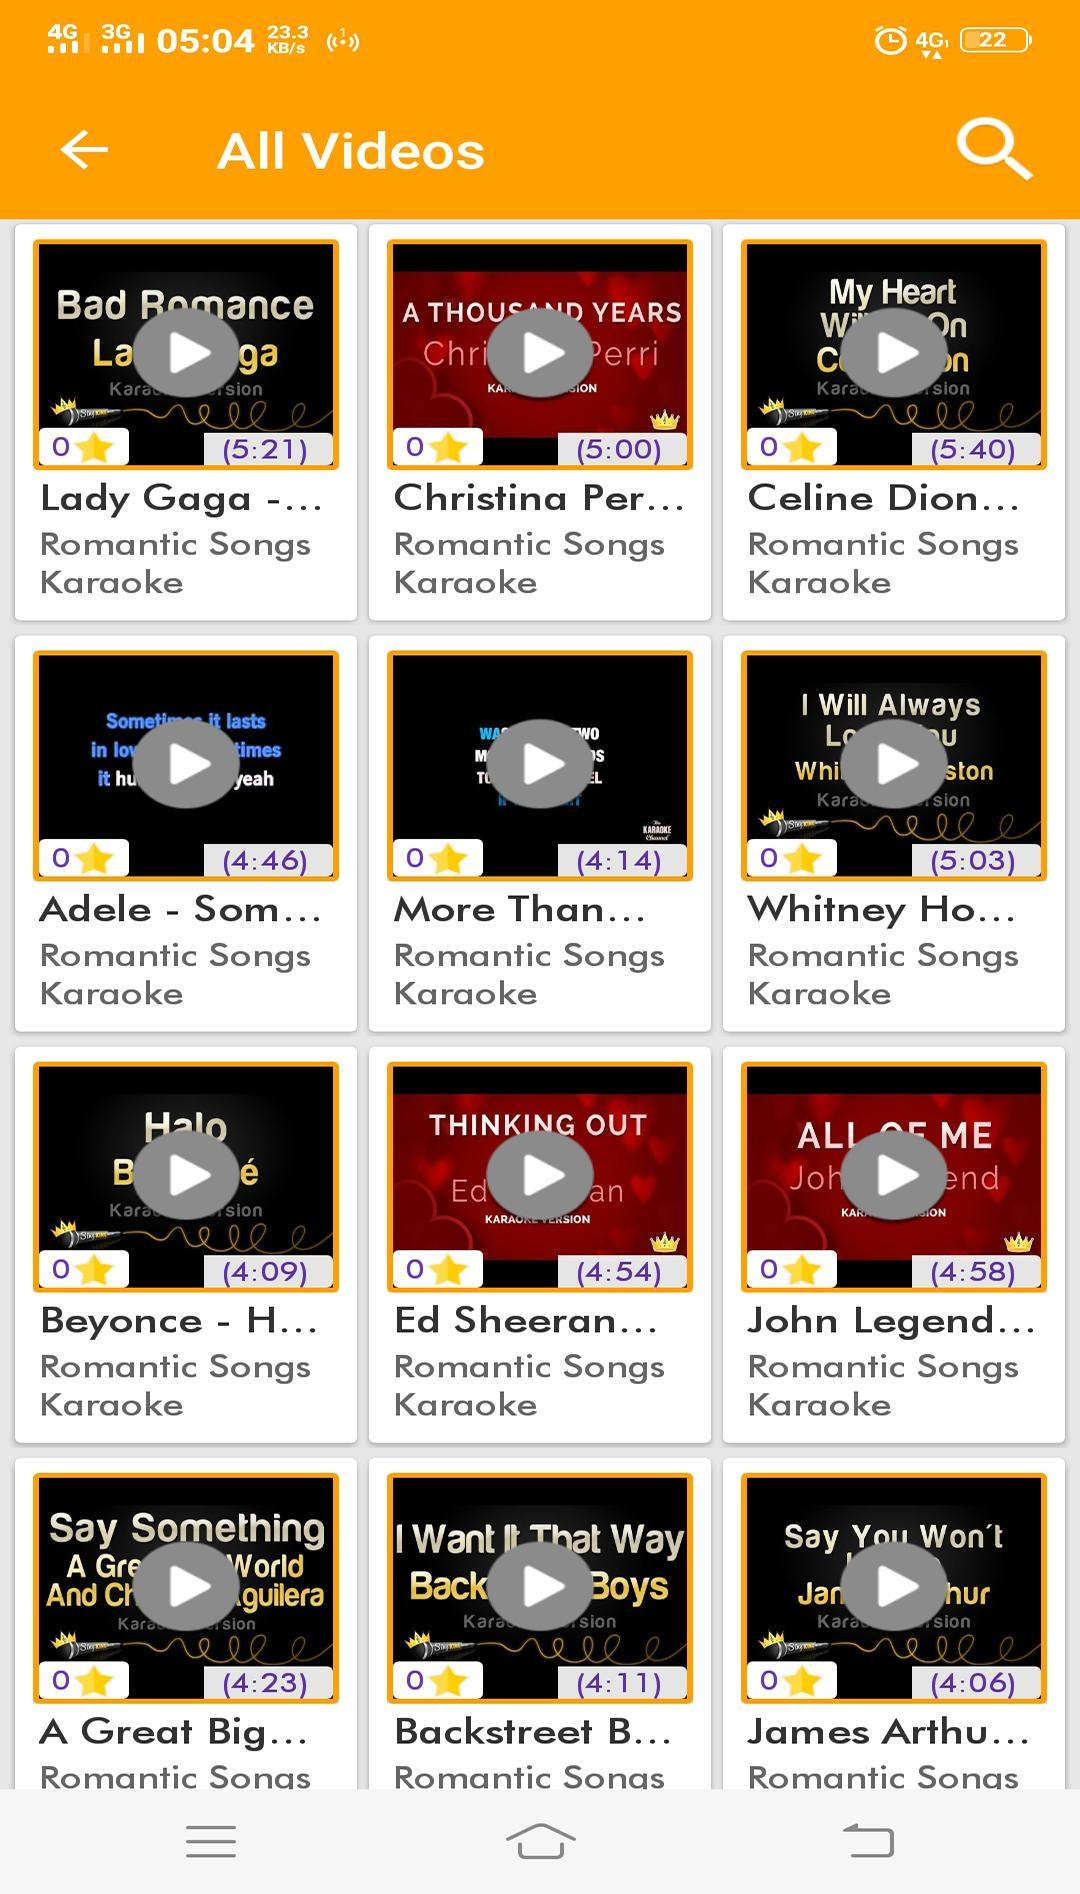 Most Romantic Songs - Karaoke Lyrics for Android - APK